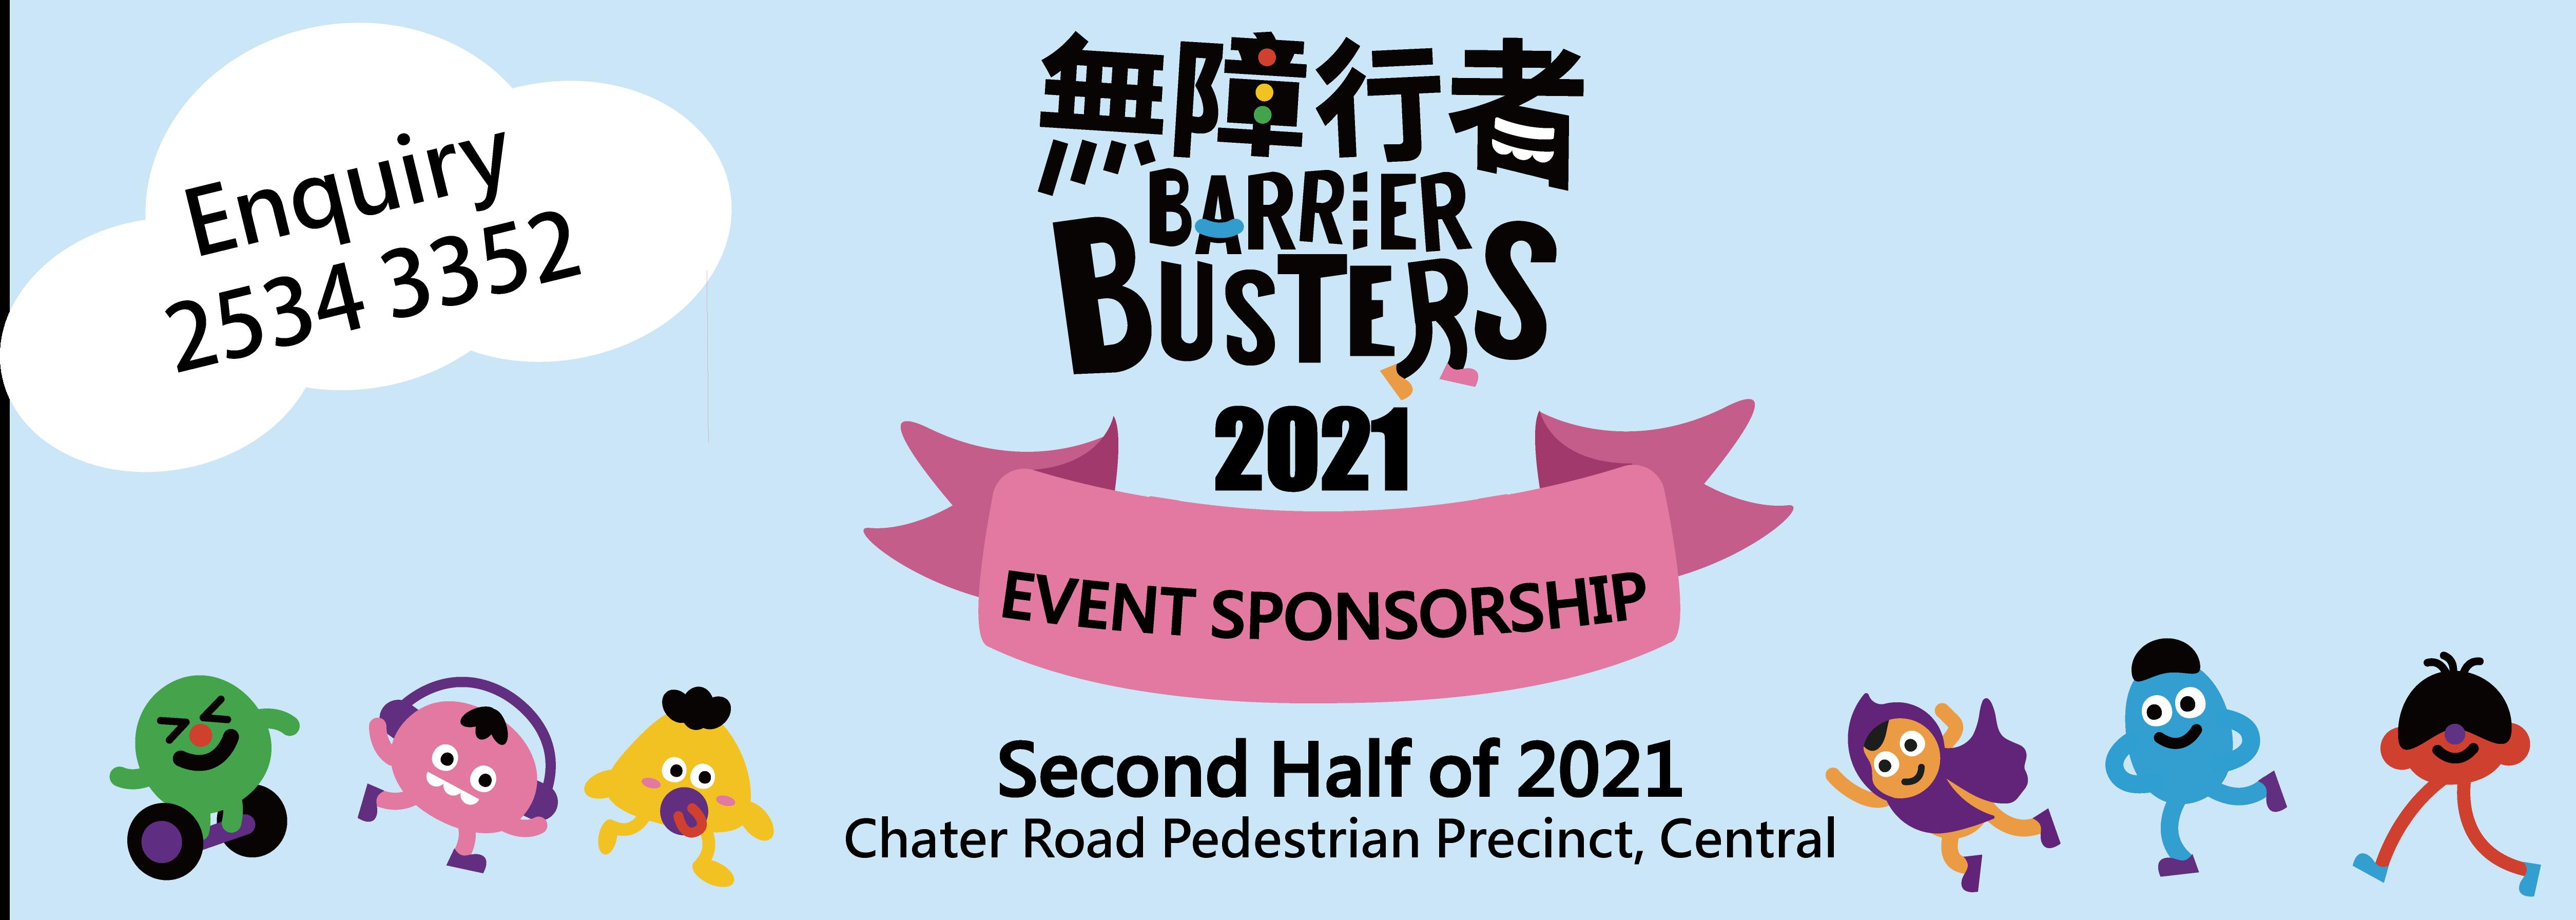 BB2021 Banner Sponsorship Eng R1